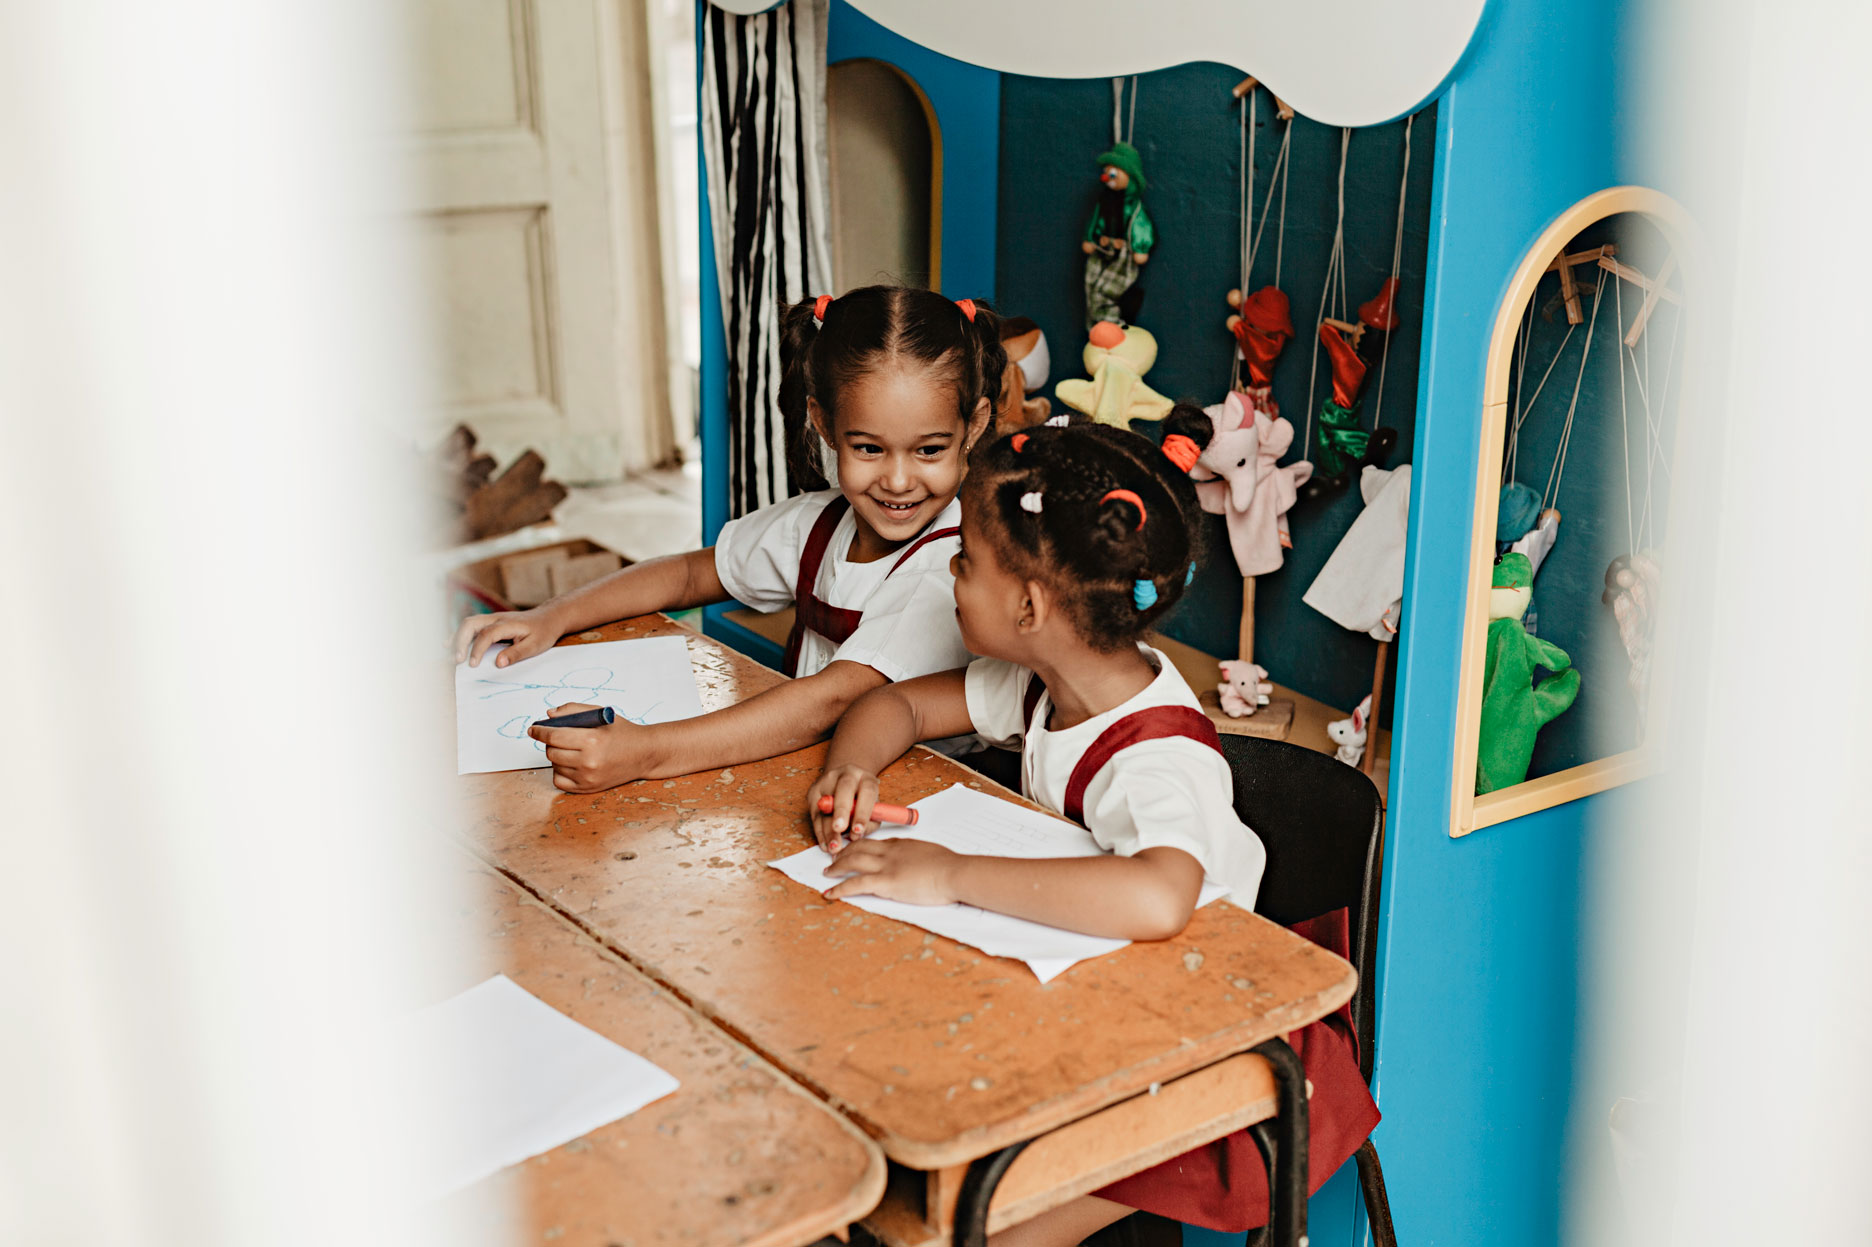 Escuela cubana